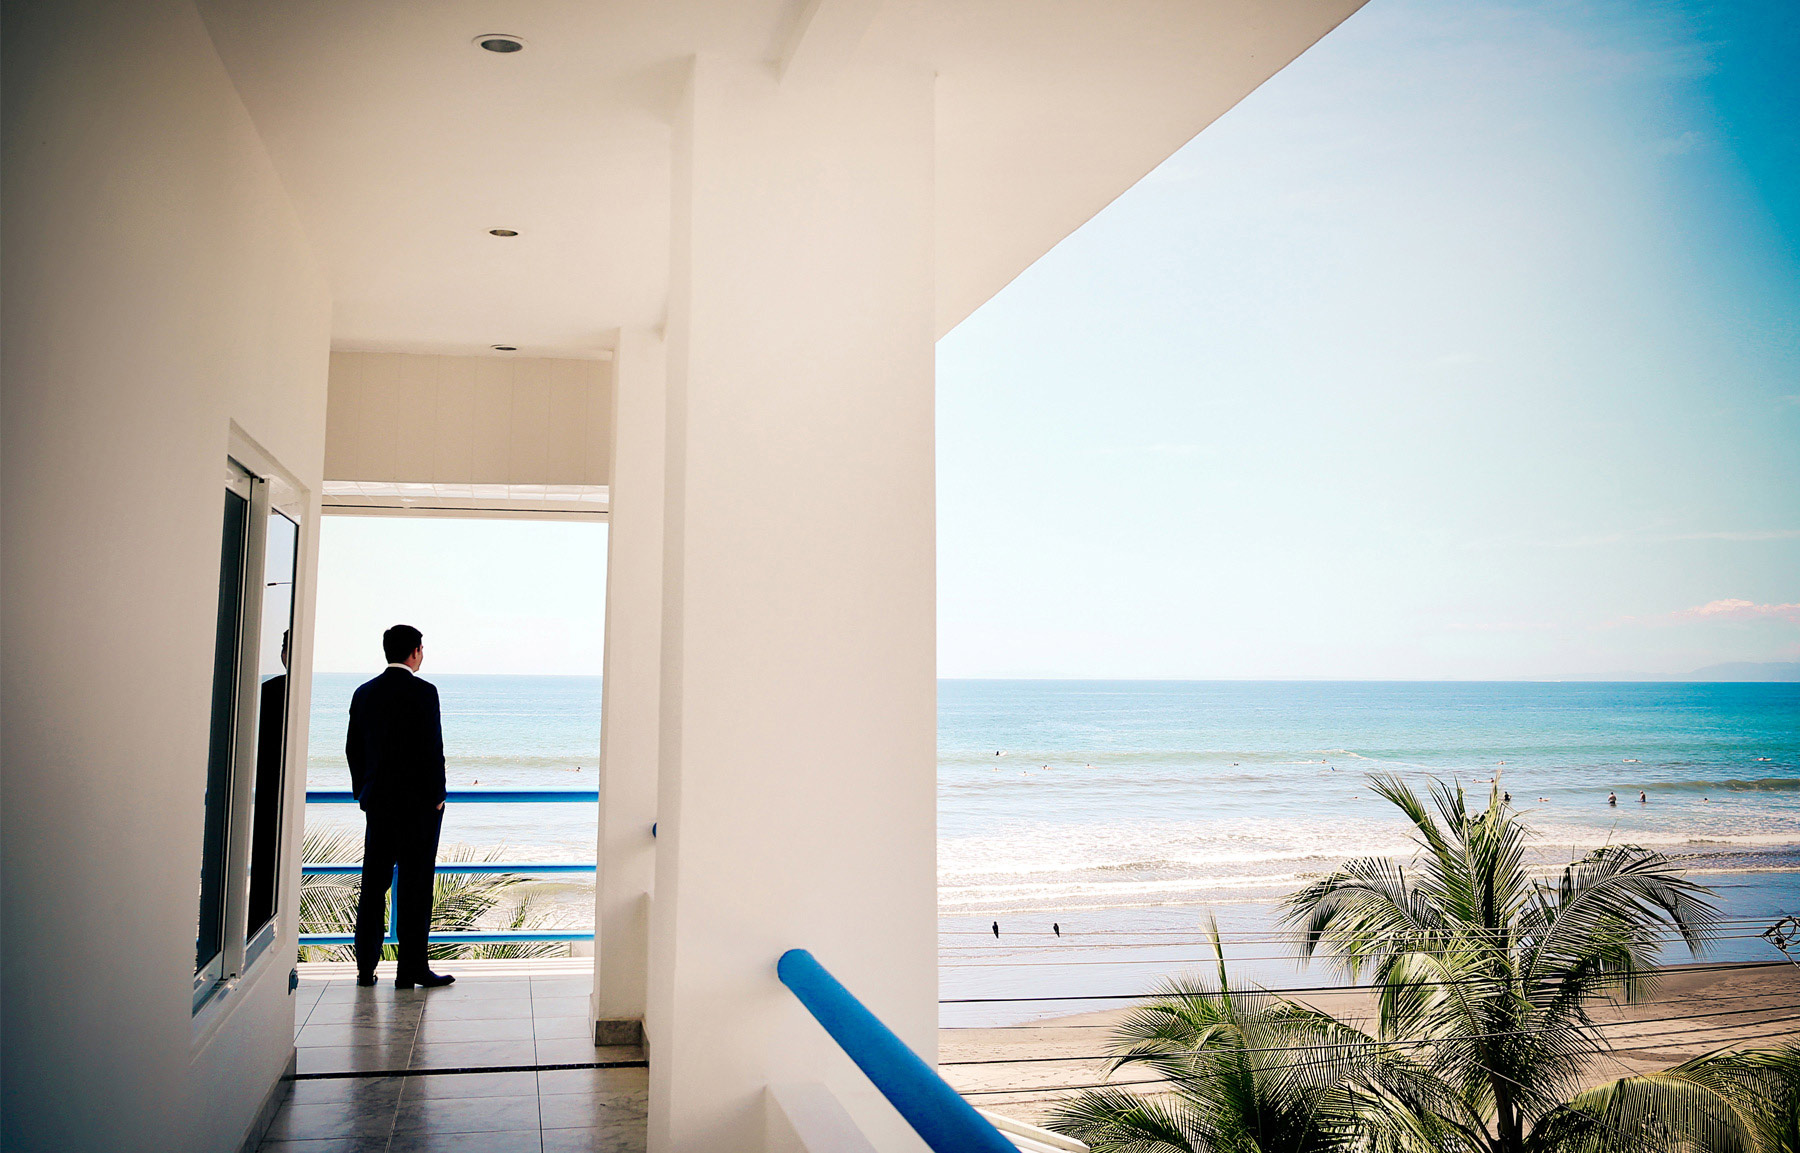 04-Costa-Rica-Wedding-Photography-by-Vick-Photography-Jaco-Tropical-Beach-Villa-Caletas-Resort-Alli-and-Duncan.jpg